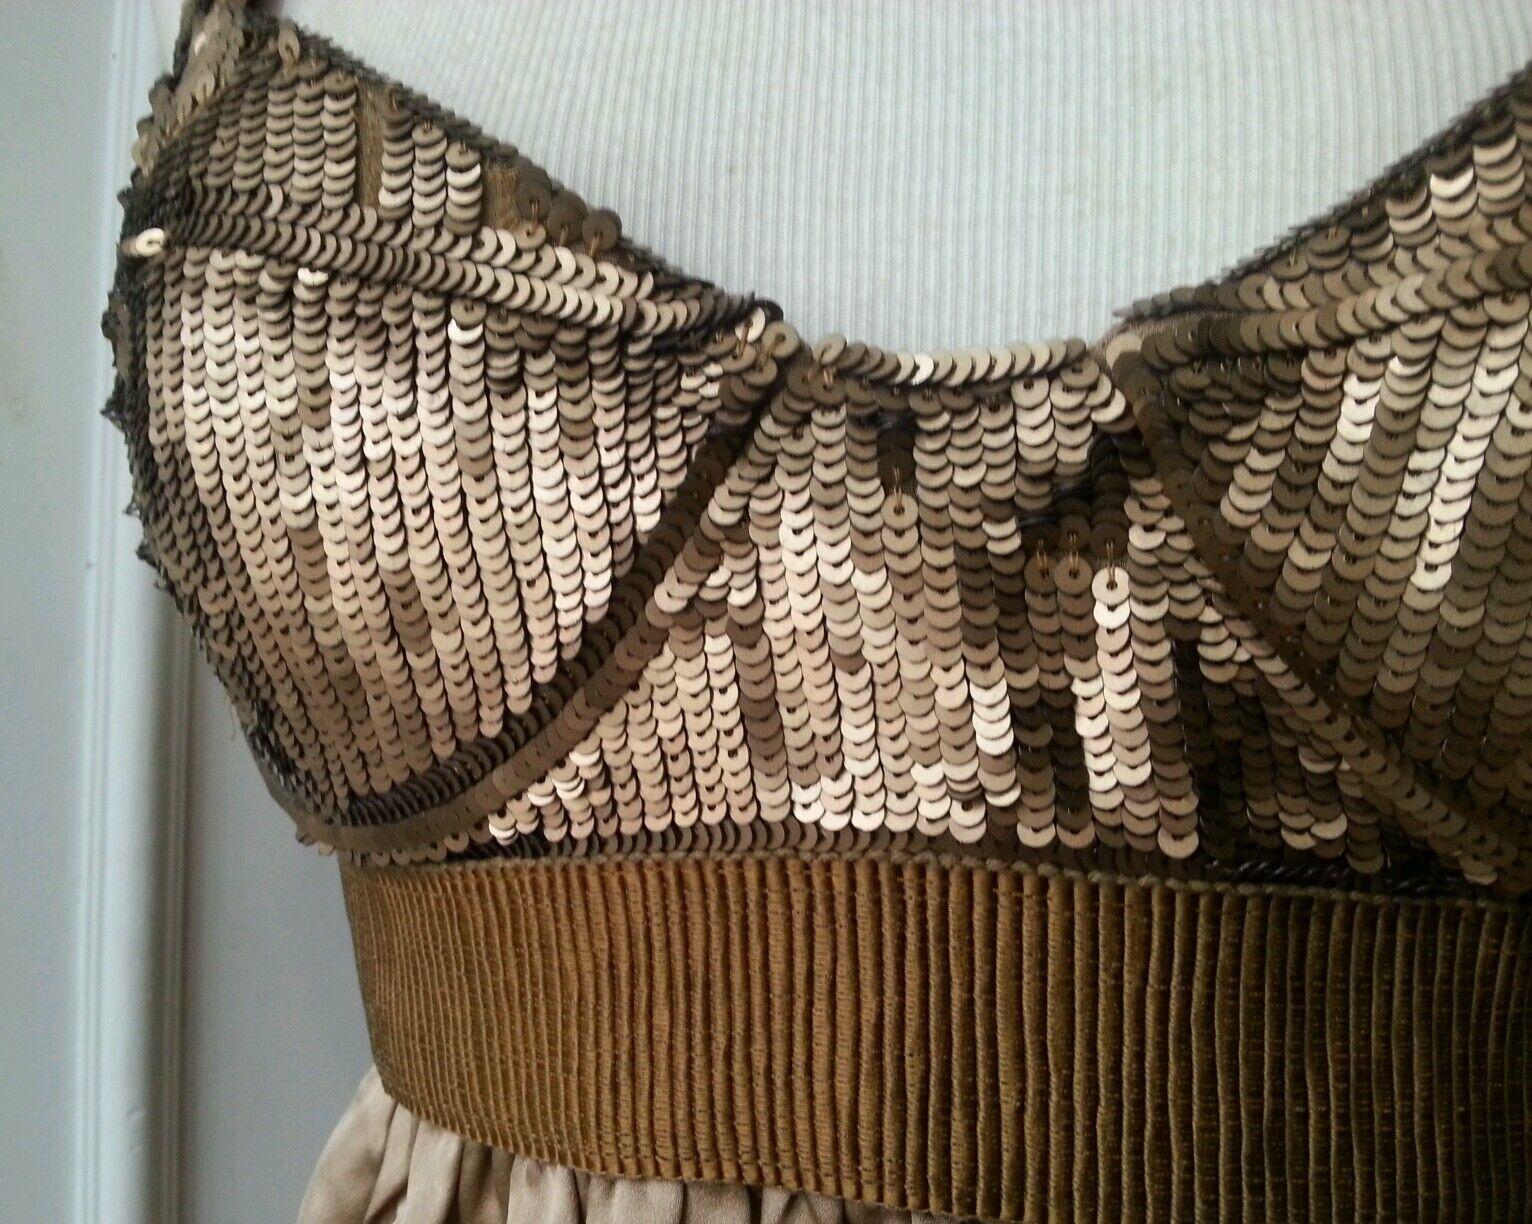 3K Proenza Schouler Gold bronze beaded Kleid-y bustier babydoll oben blouse S